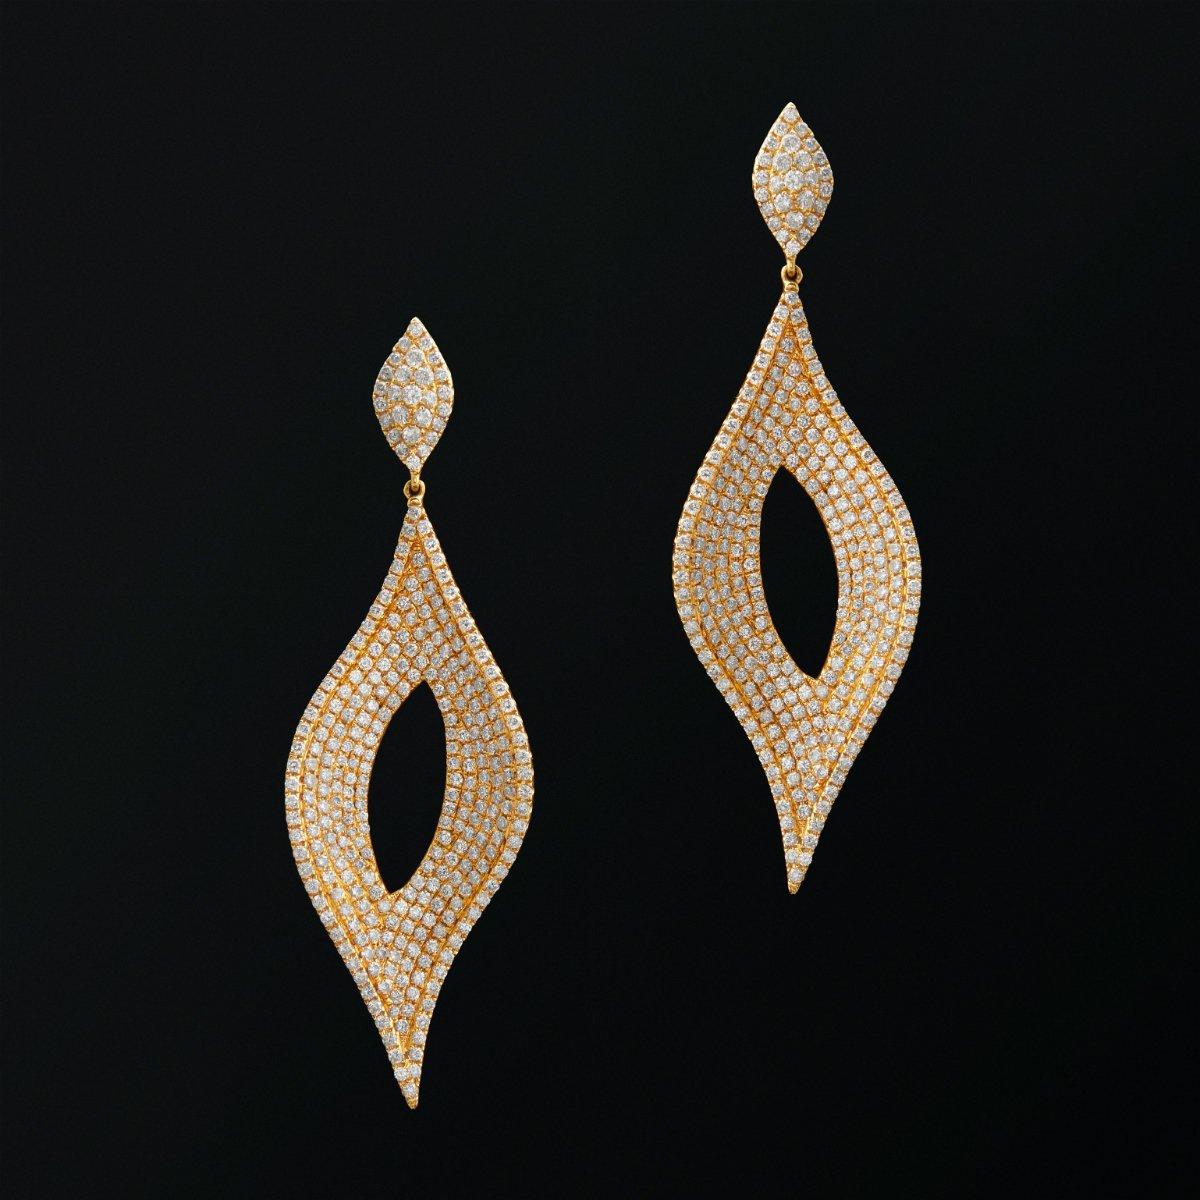 14KT Yellow Gold Diamond Masquerade Earrings